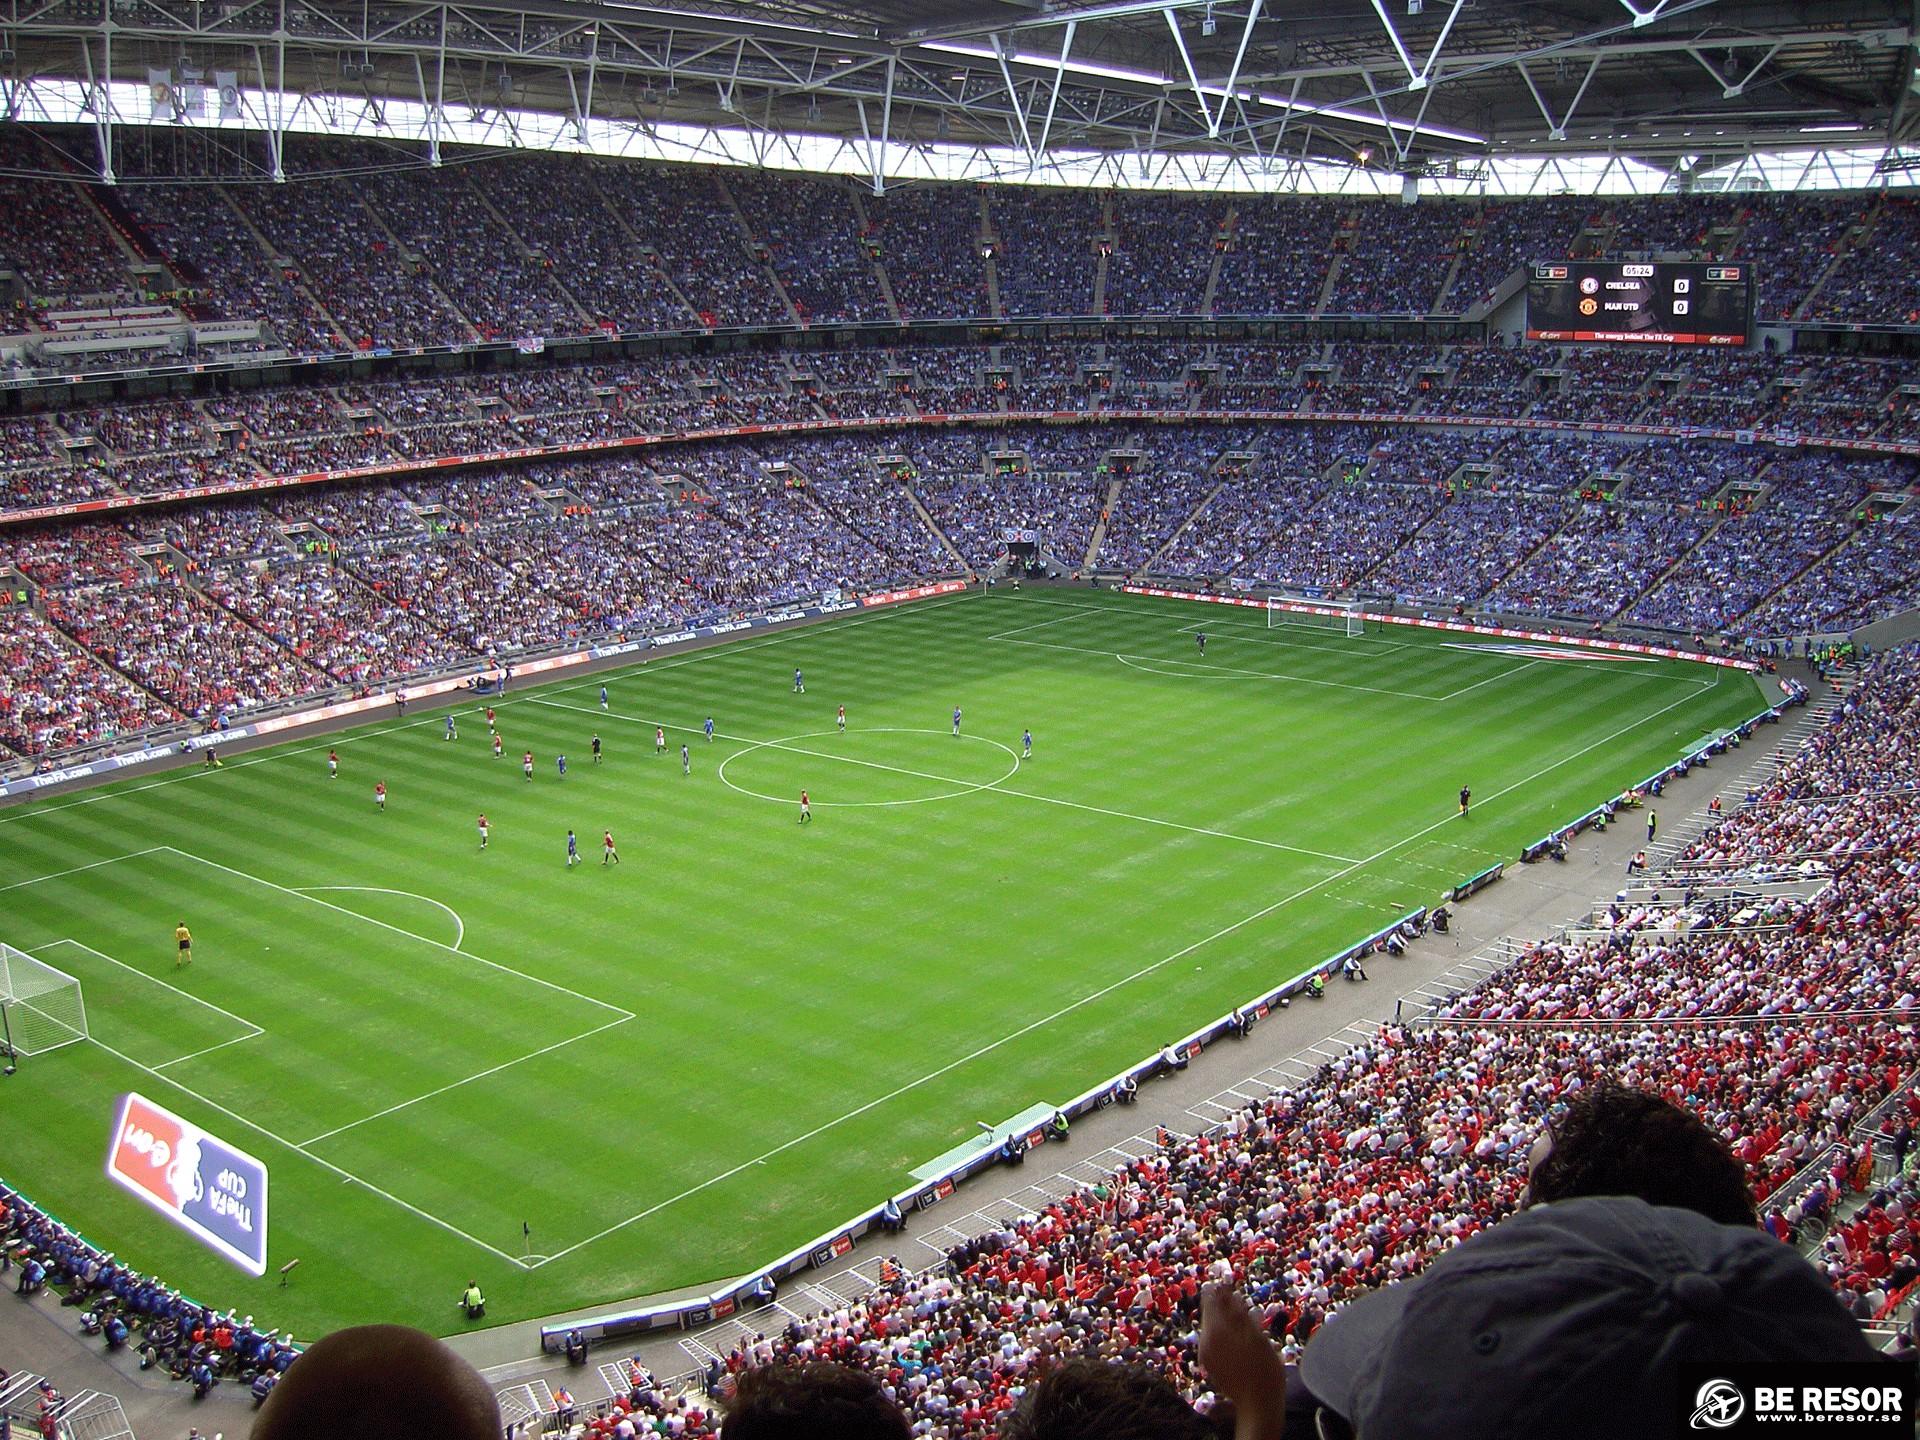 Fotbollsresor till England & Premier League